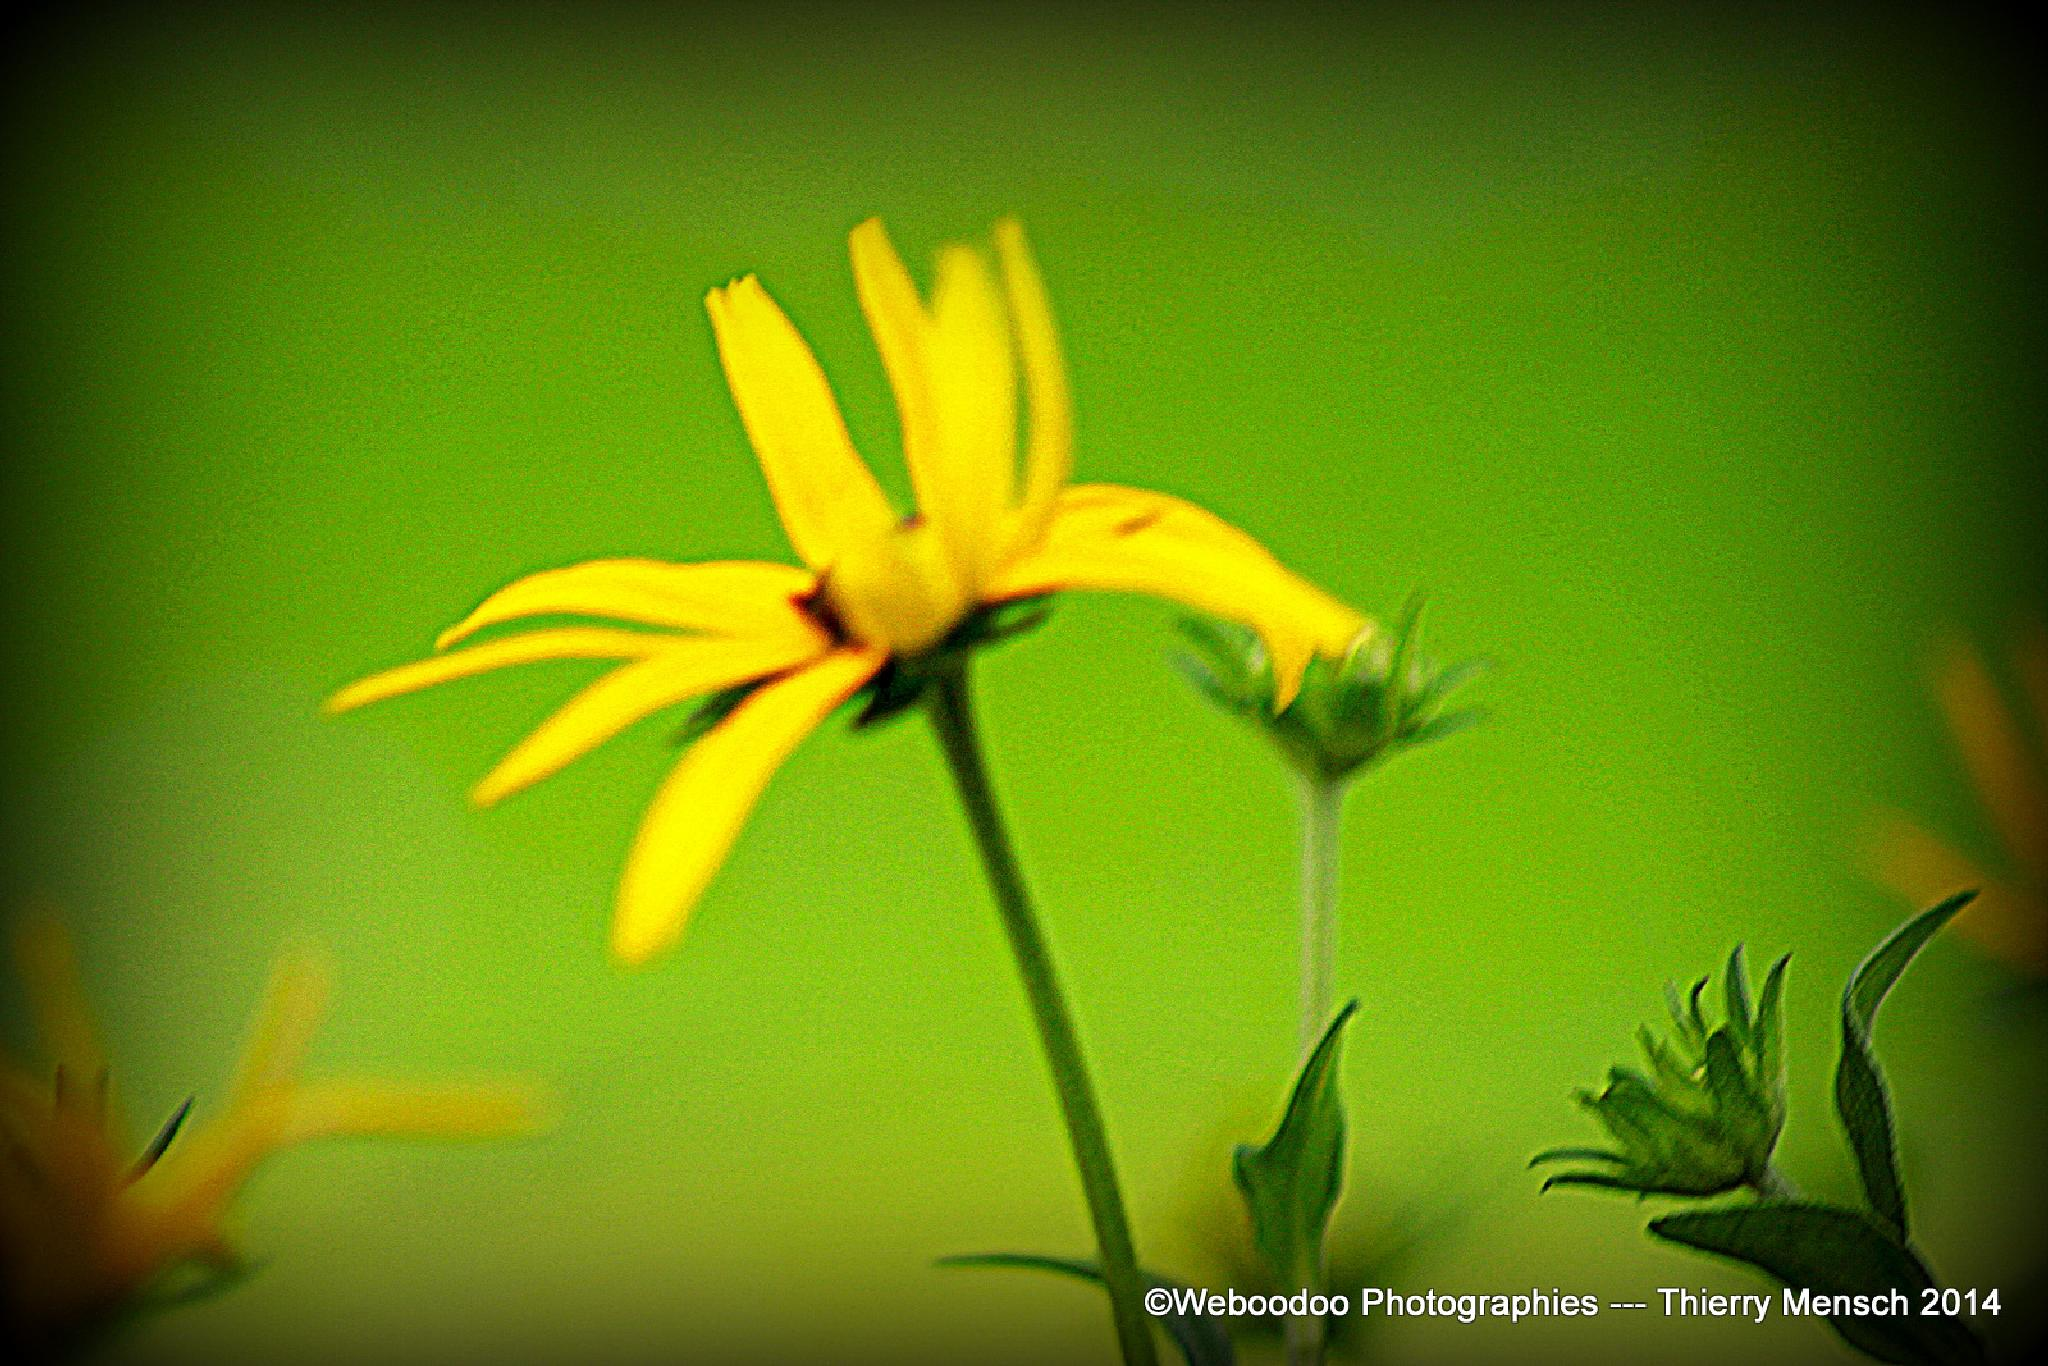 Fleur jaune by Weboodoo Photographies